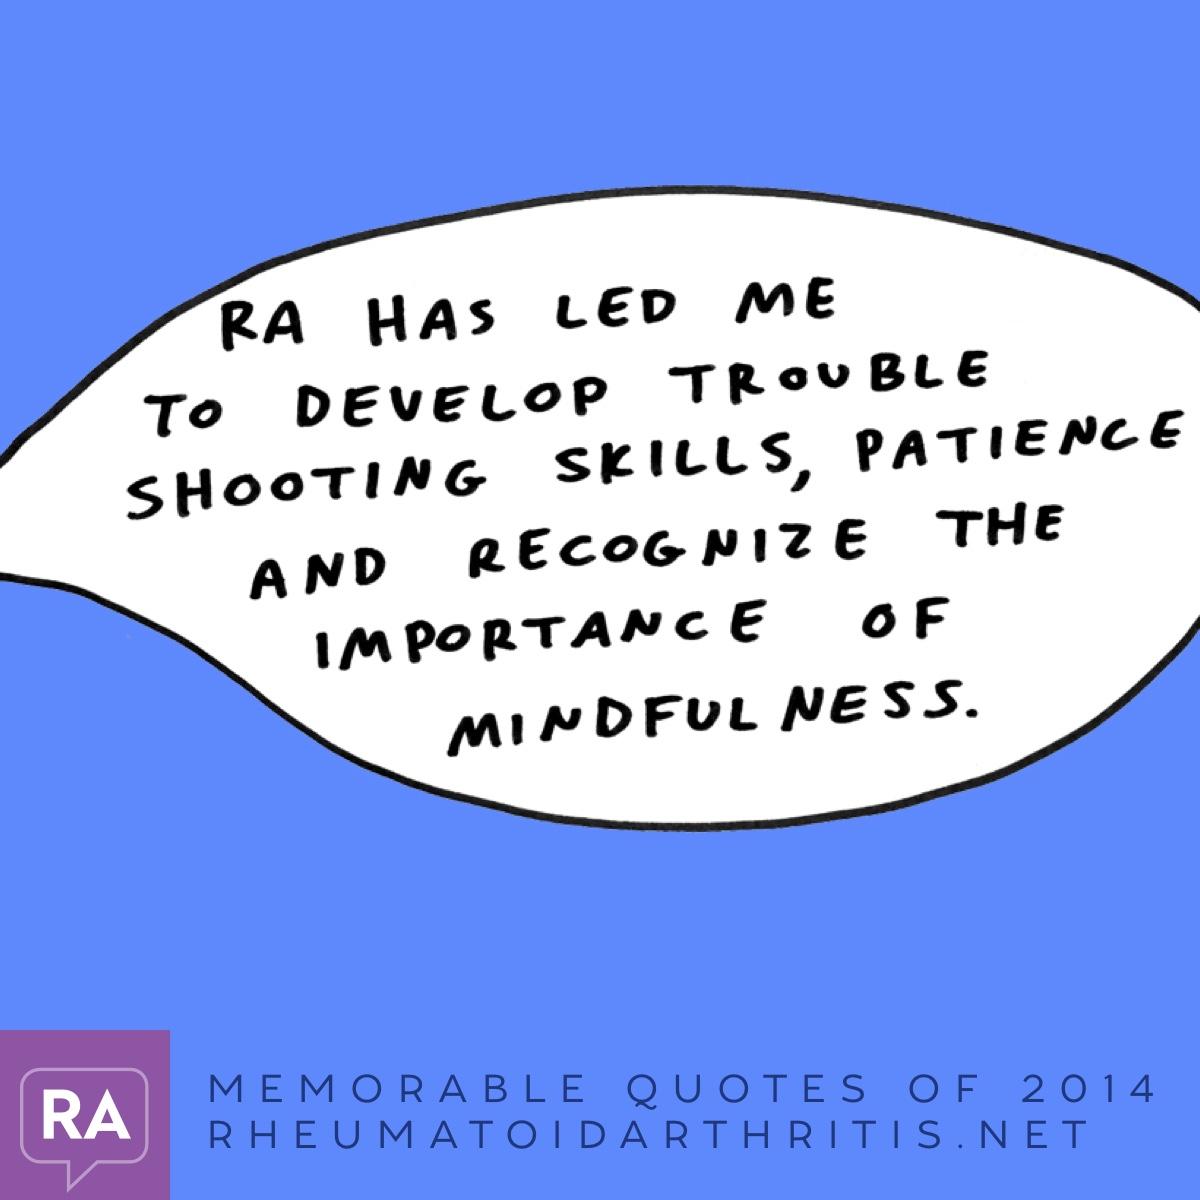 Memorable Quotes Memorable Quotes Of 2014  Rheumatoidarthritis